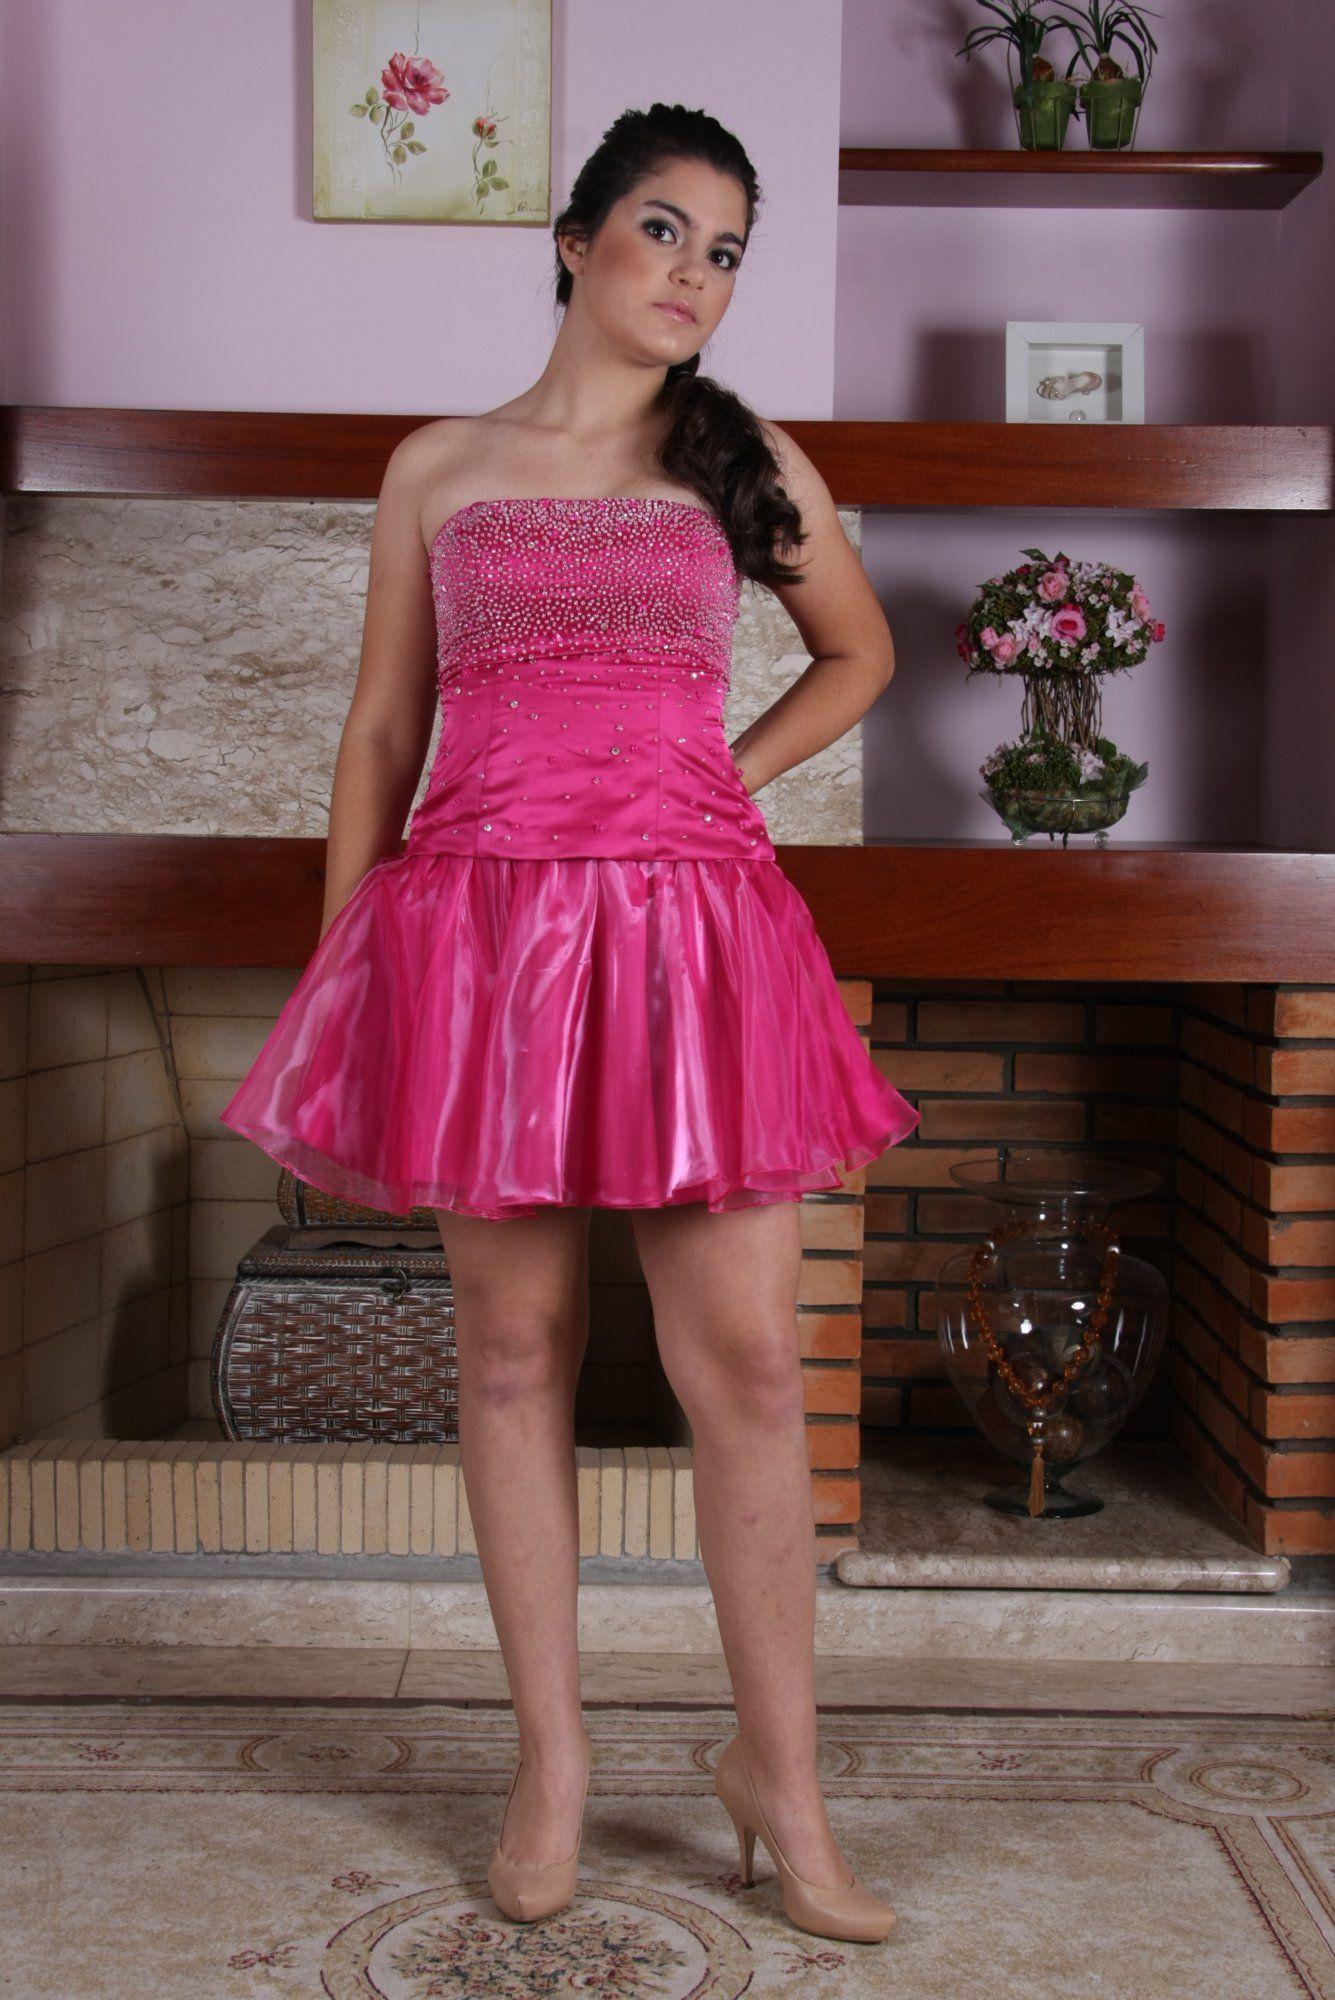 Vestido de Debutante Pink - 19 - Hipnose Alta Costura e Spa para Noivas e Noivos - Campinas - SP Vestido de Debutante, Vestido de Debutante Pink, Hipnose Alta Costura